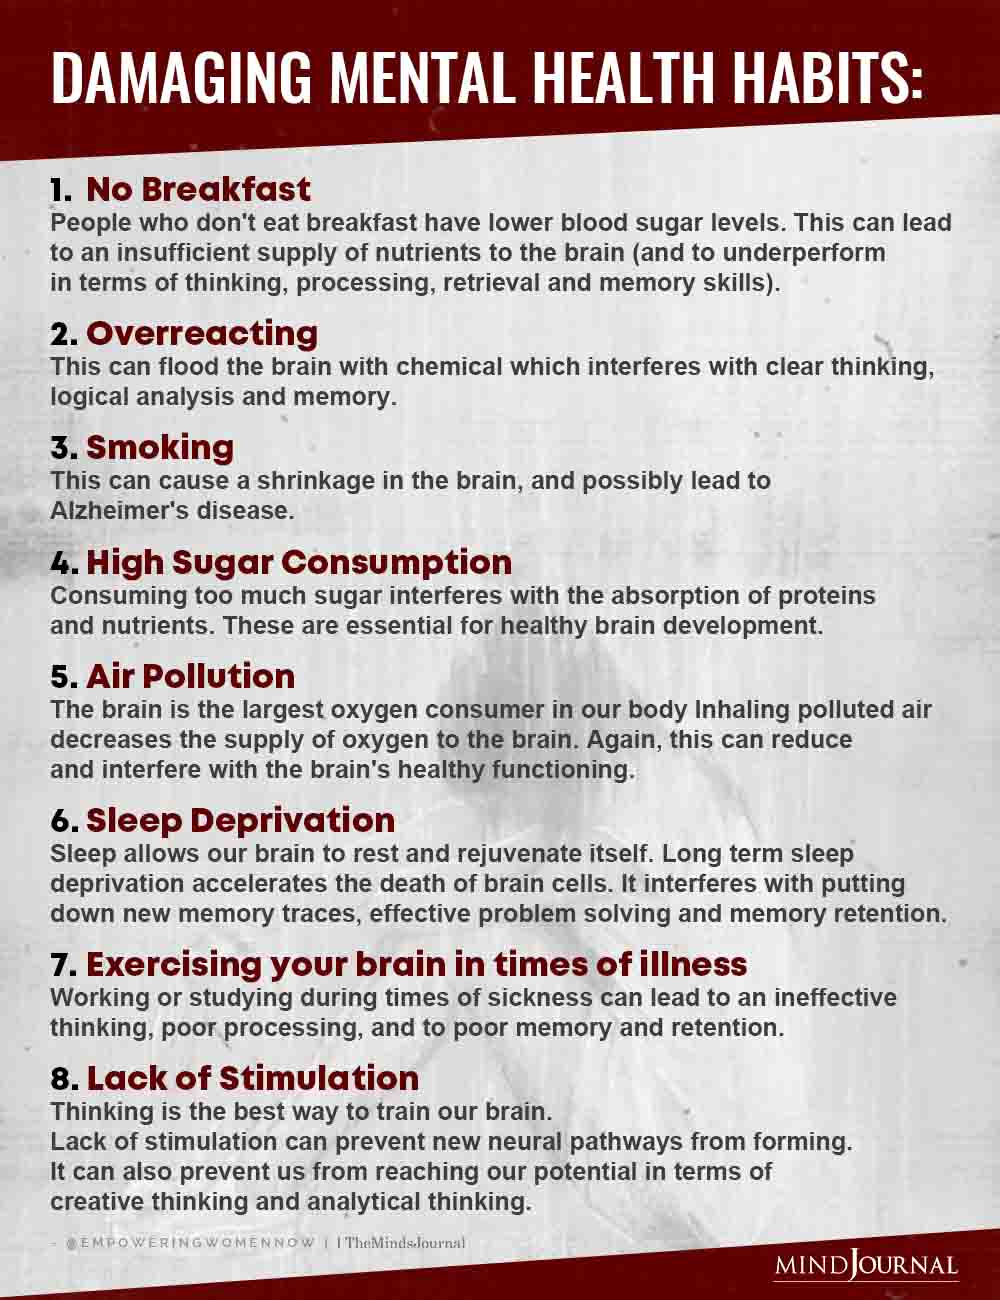 Damaging Mental Health Habits